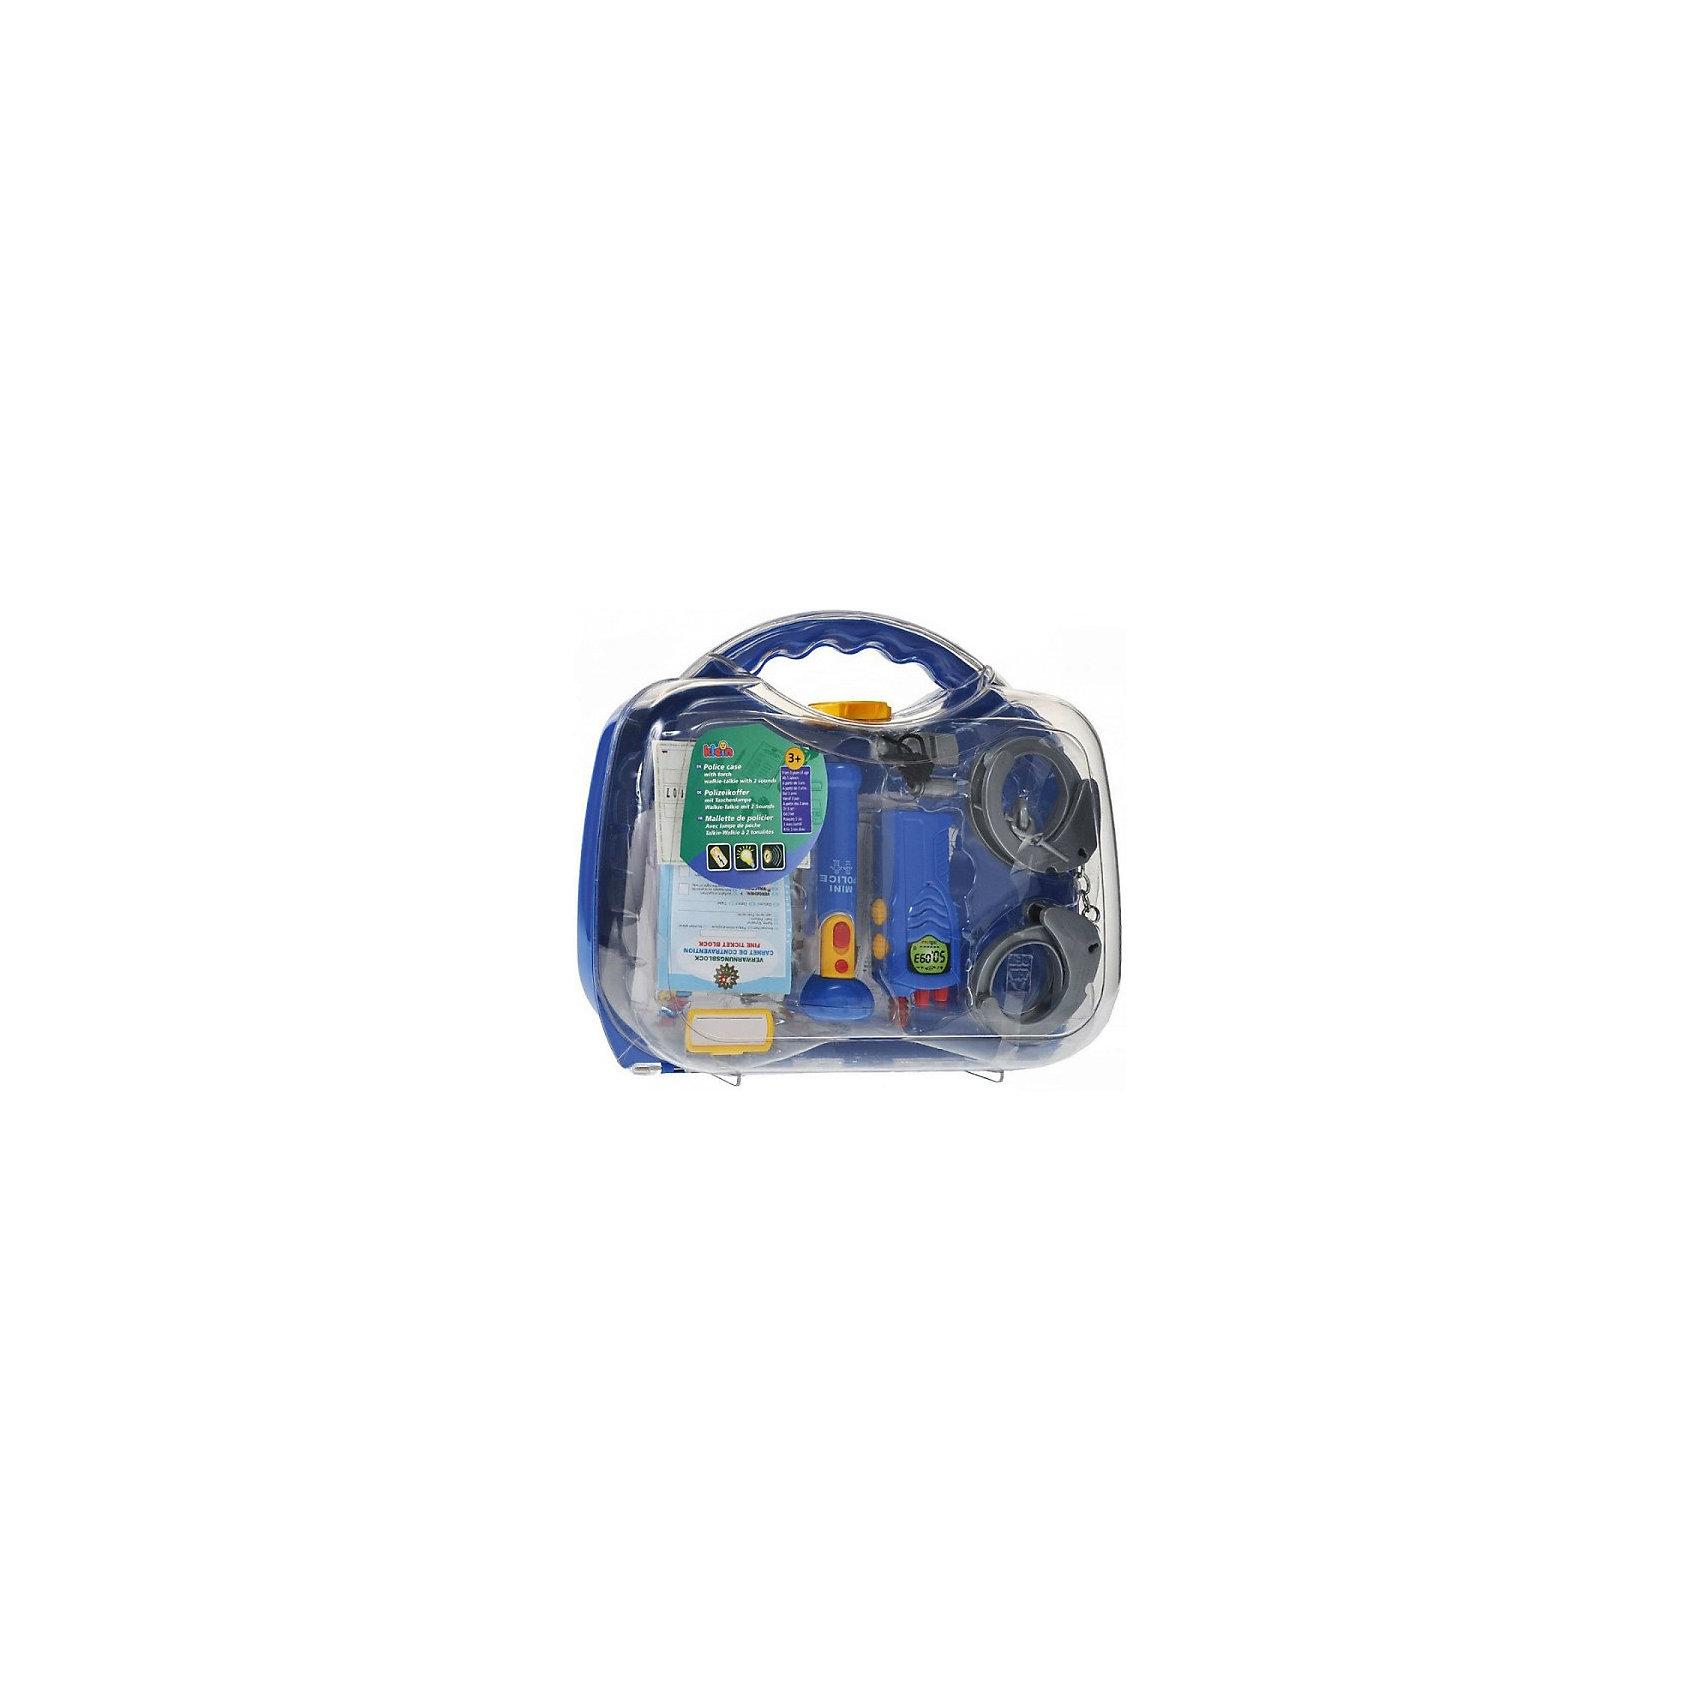 klein Набор полицейского в кейсе, Klein блюдо сервировочное walmer shell цвет белый 17 5 х 16 х 3 см